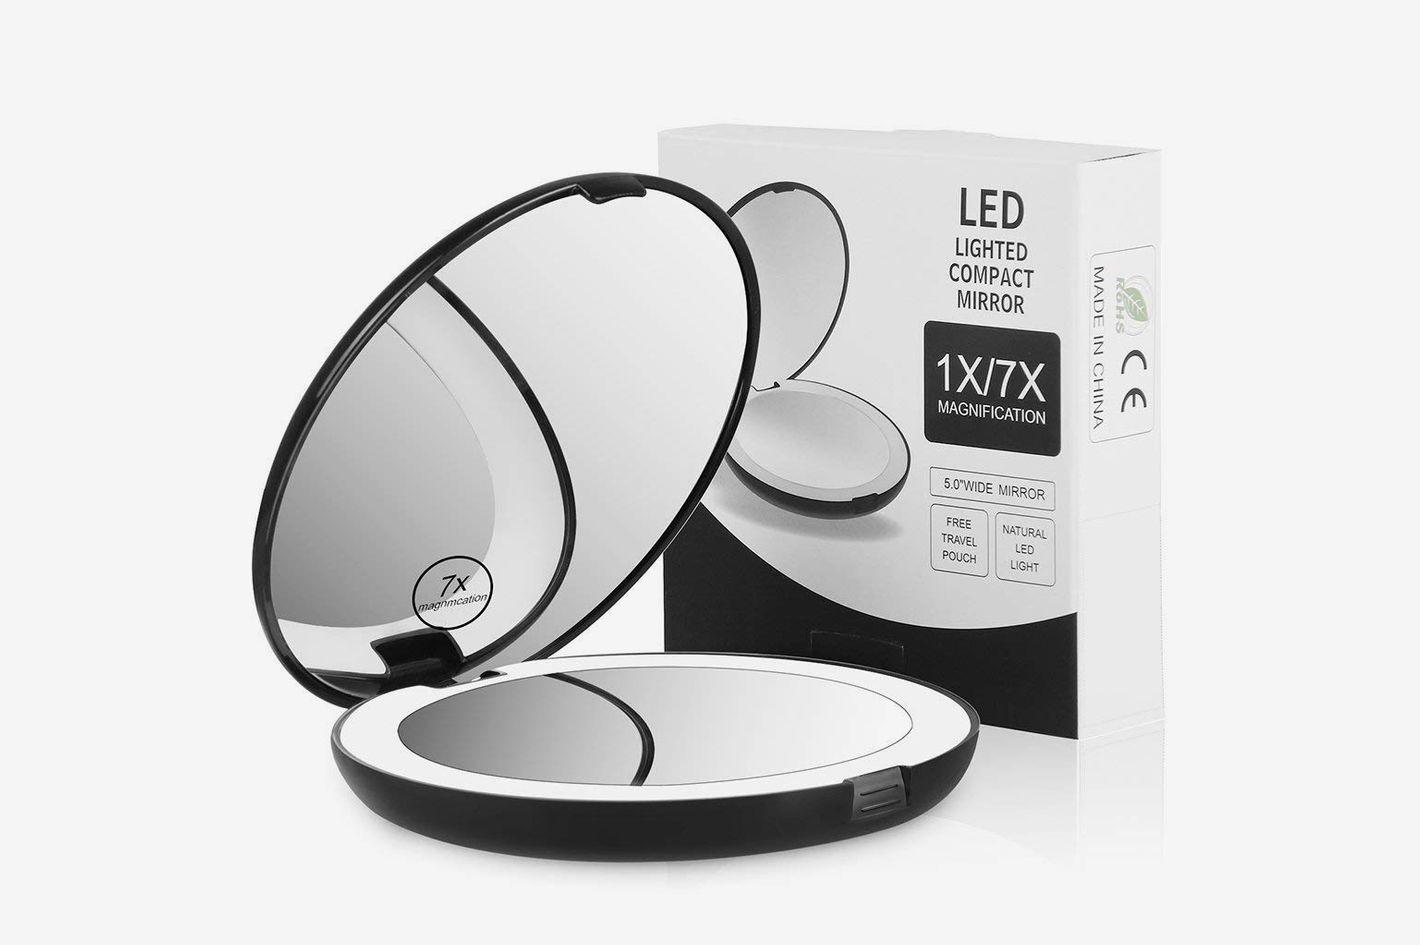 11 best vanity makeup mirrors lights 2018 terresa lighted travel makeup mirror aloadofball Gallery